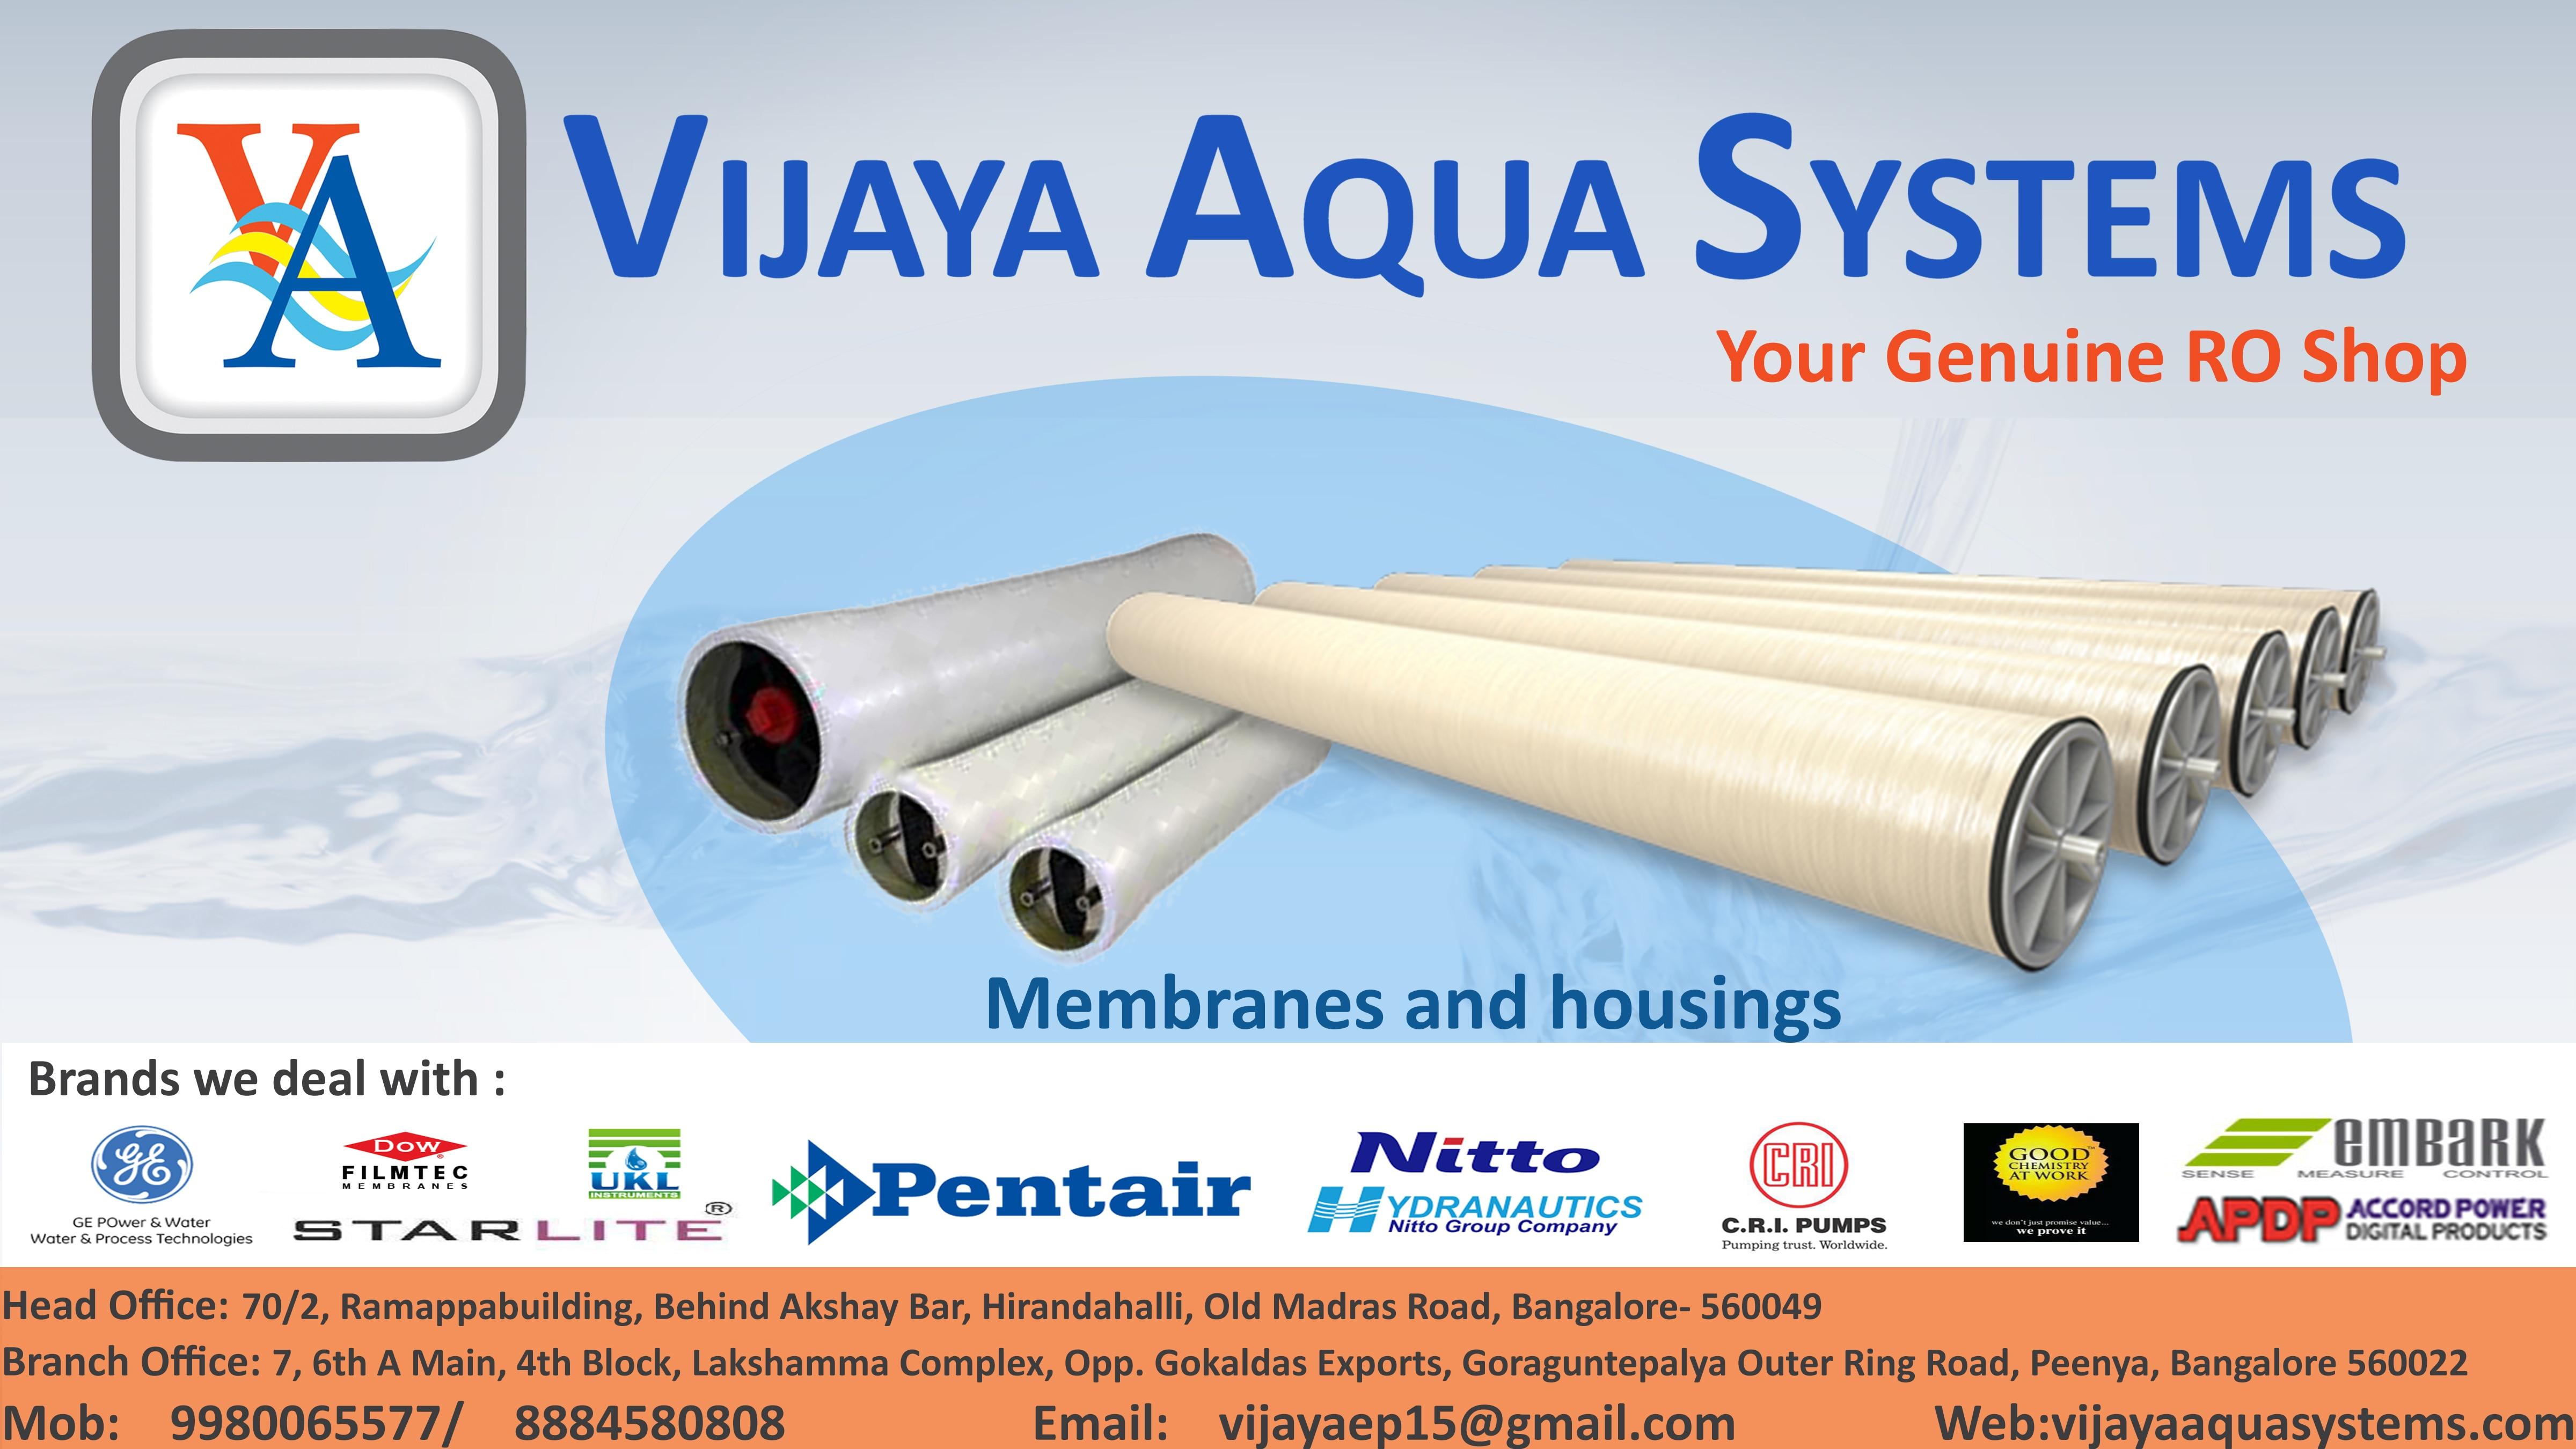 Vijaya Aqua Systems